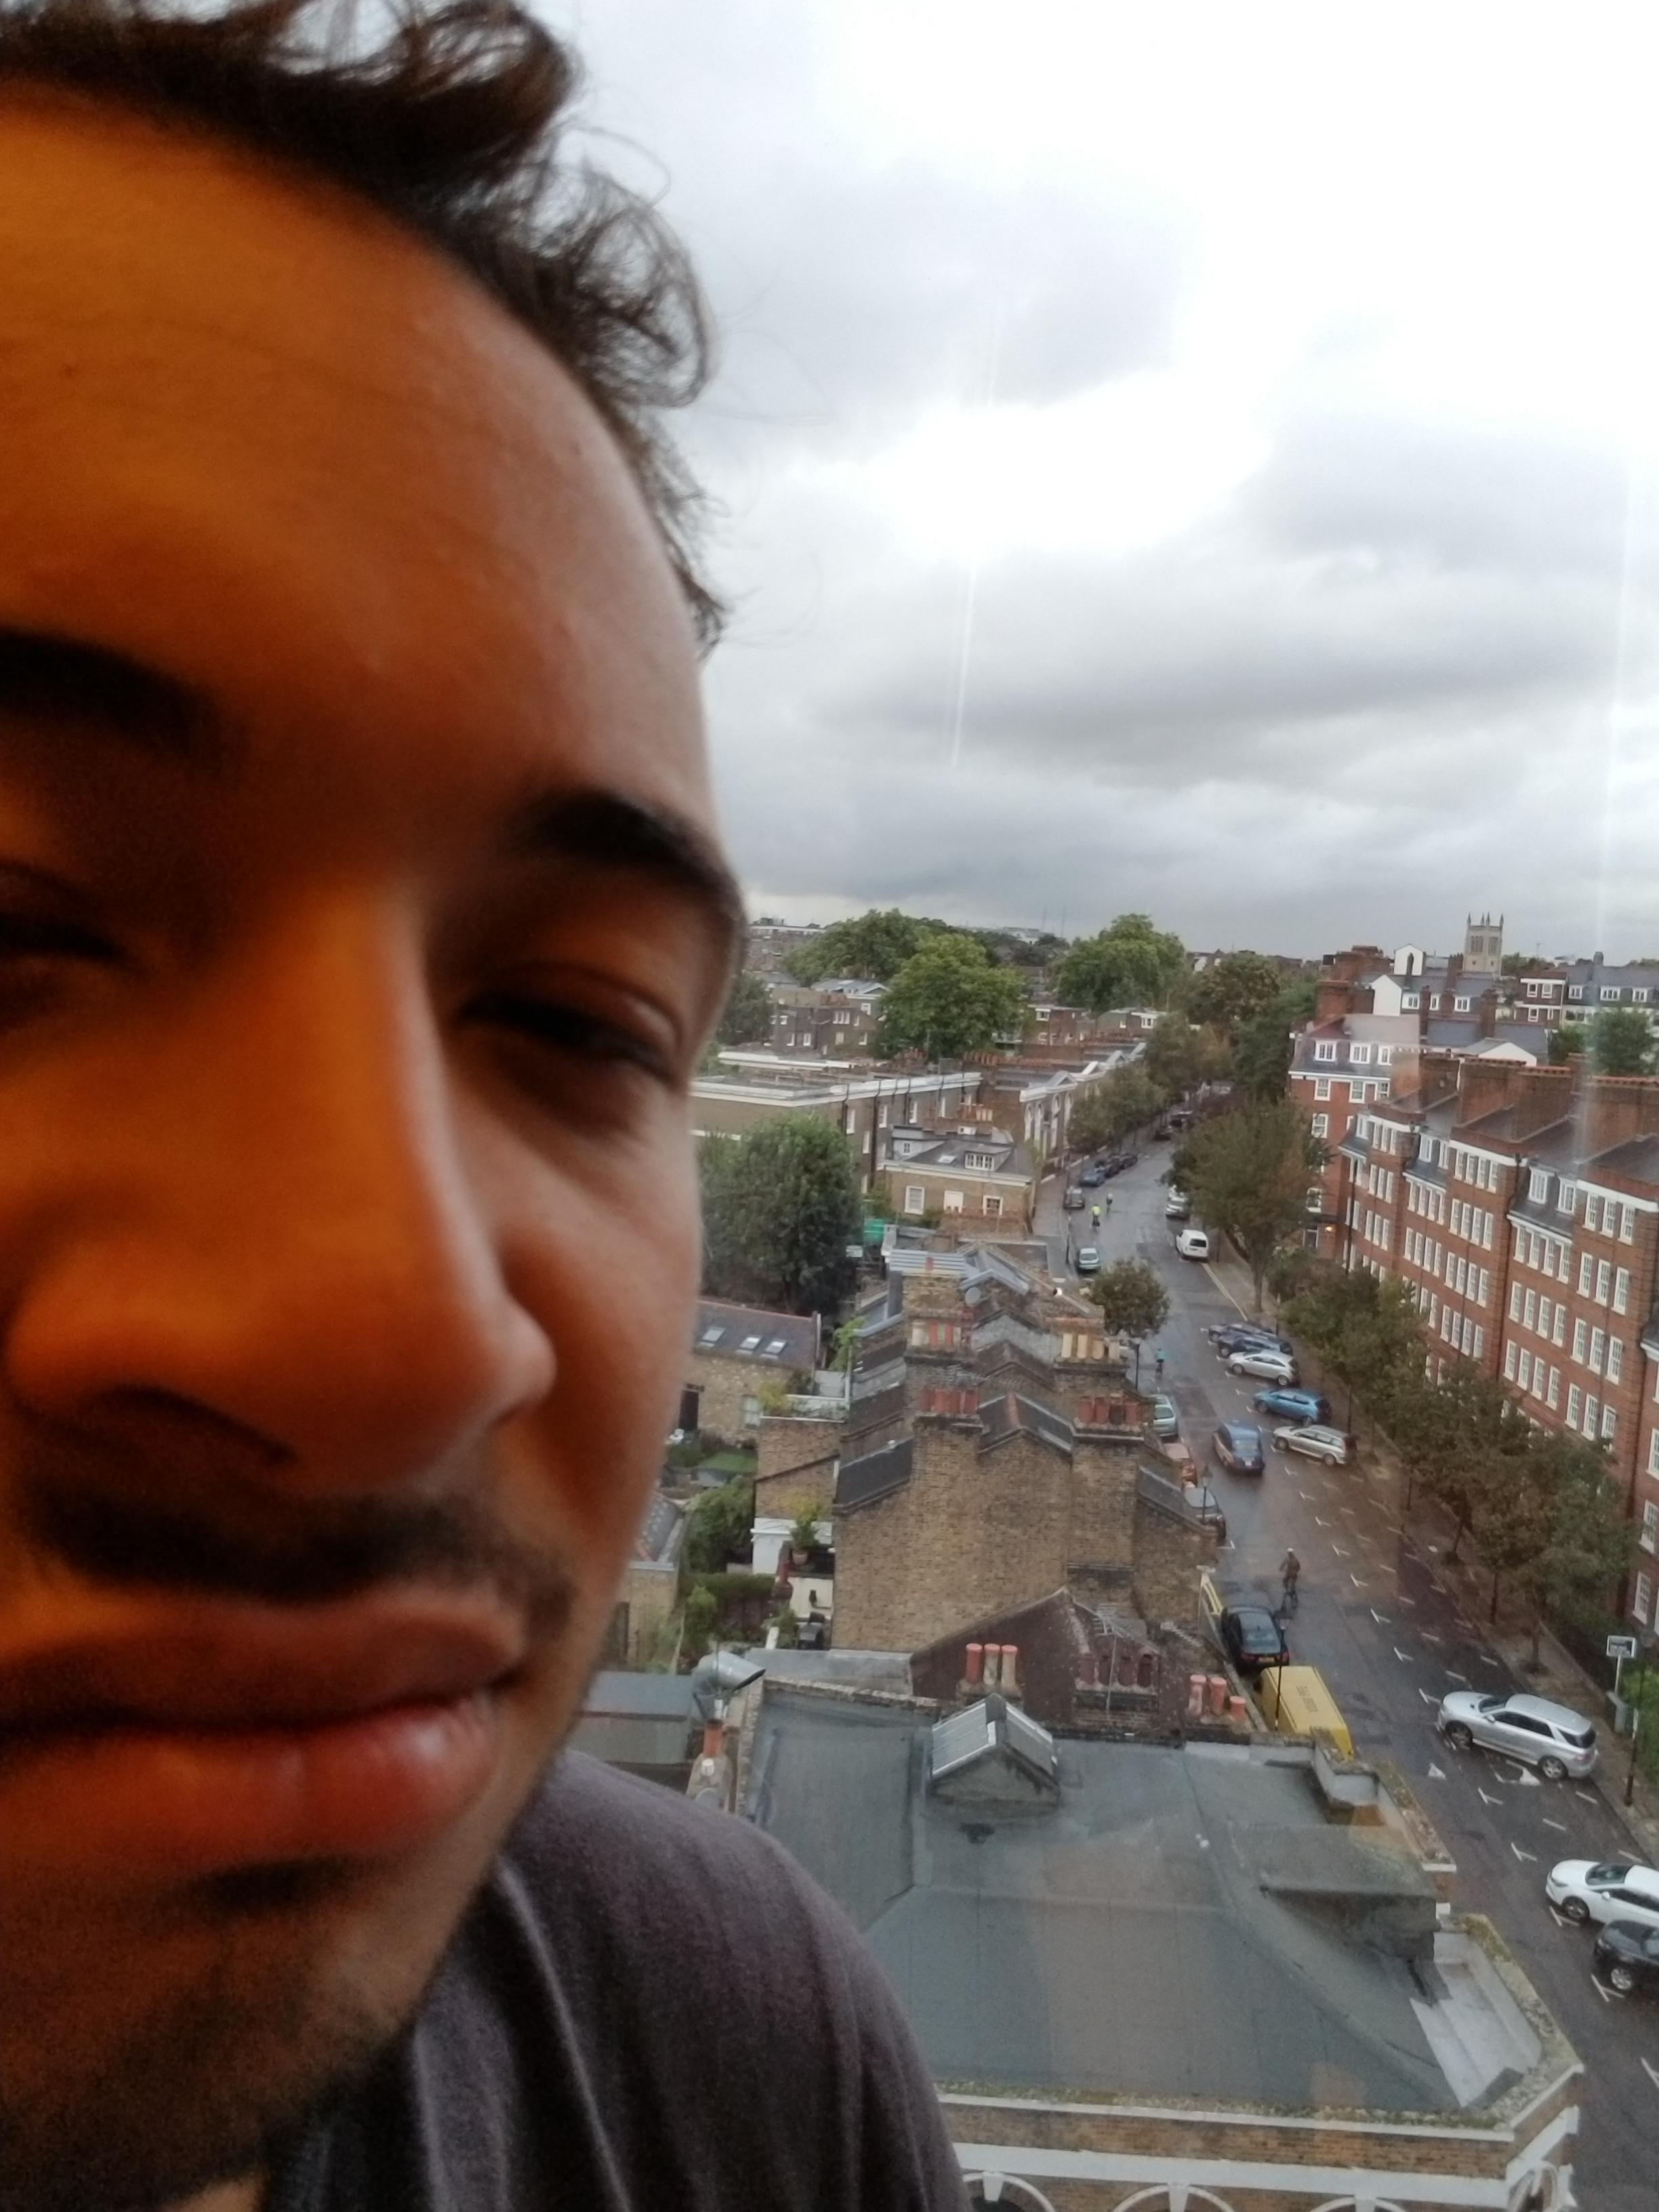 CAPAStudyAbroad_London_Fall2017_From Thaddeus Kaszuba - Looking Out the Window.jpg